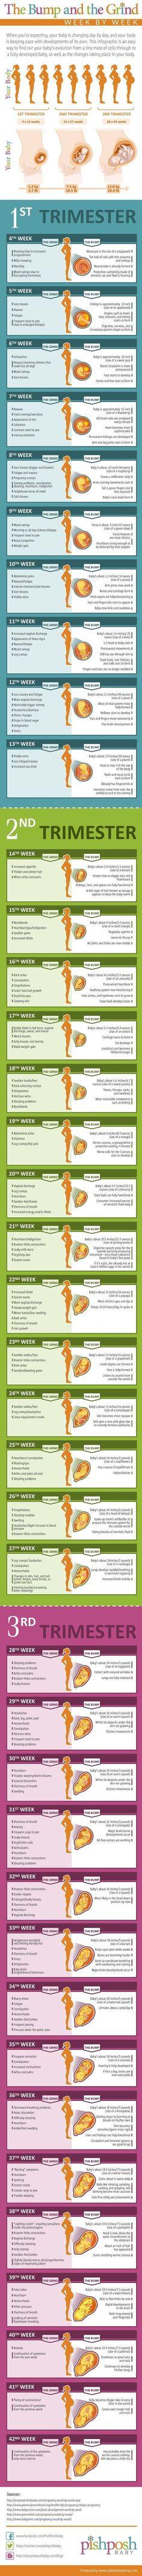 Pregnancy Decisions, Maternity, Trimester, Advice and Tips #pregnancytrimesters #pregnancytips #pregnancyadvice